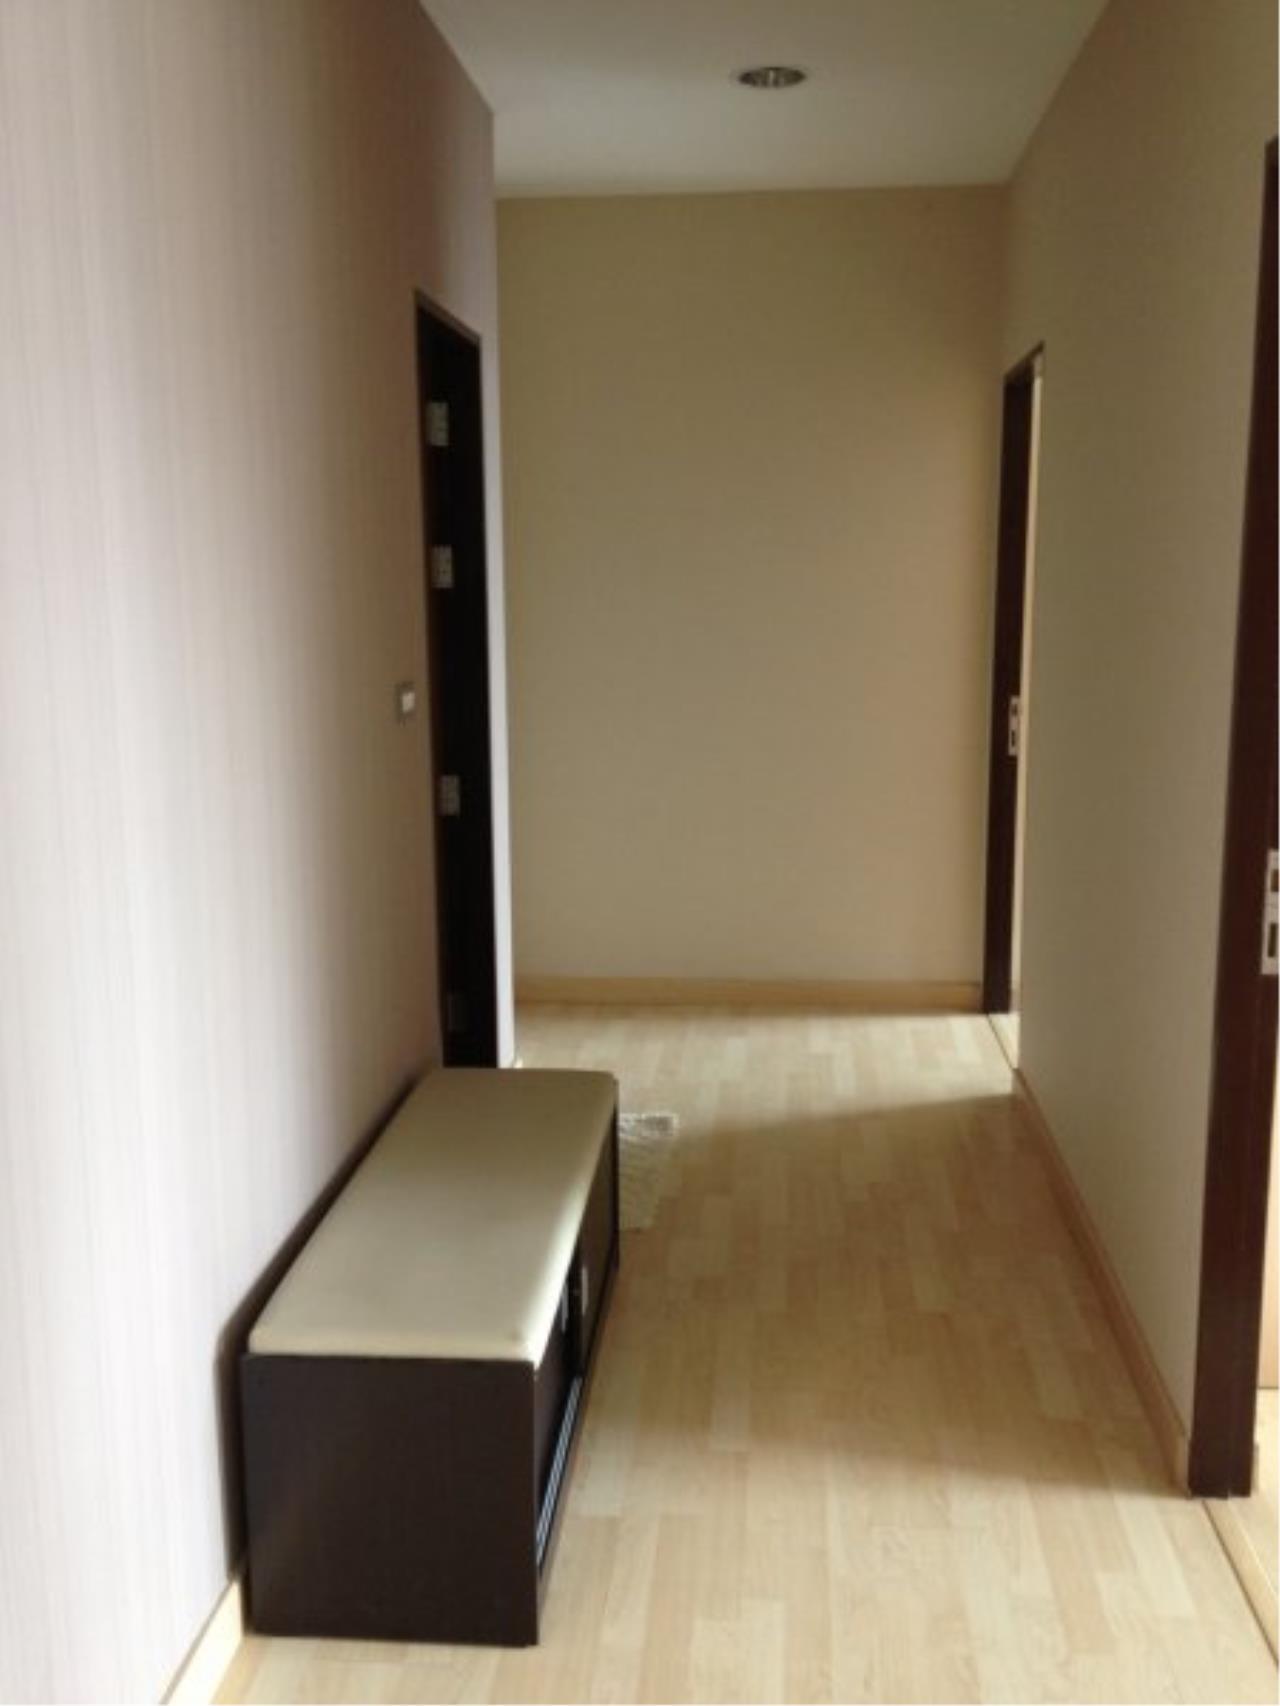 Piri Property Agency's Modern 2 Bedrooms in the 59 Heritage Bulding for rent on high floor 5